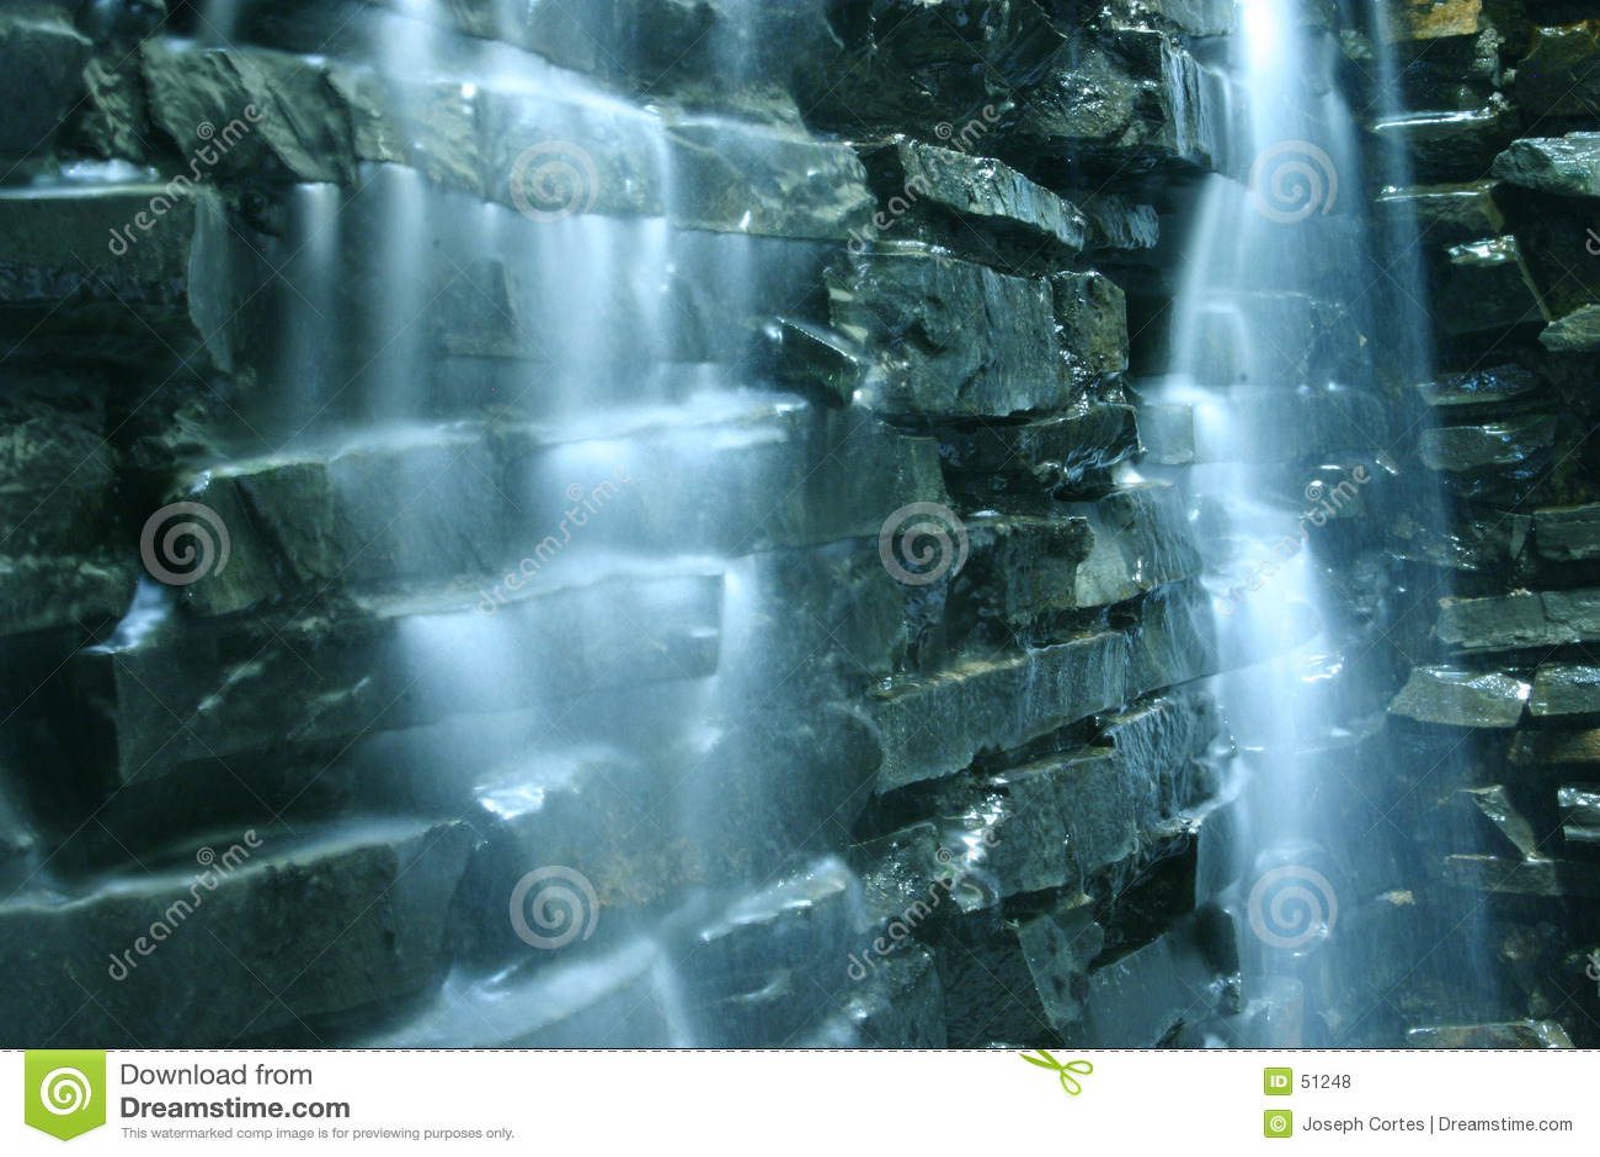 Cascata e rochas de queda da água